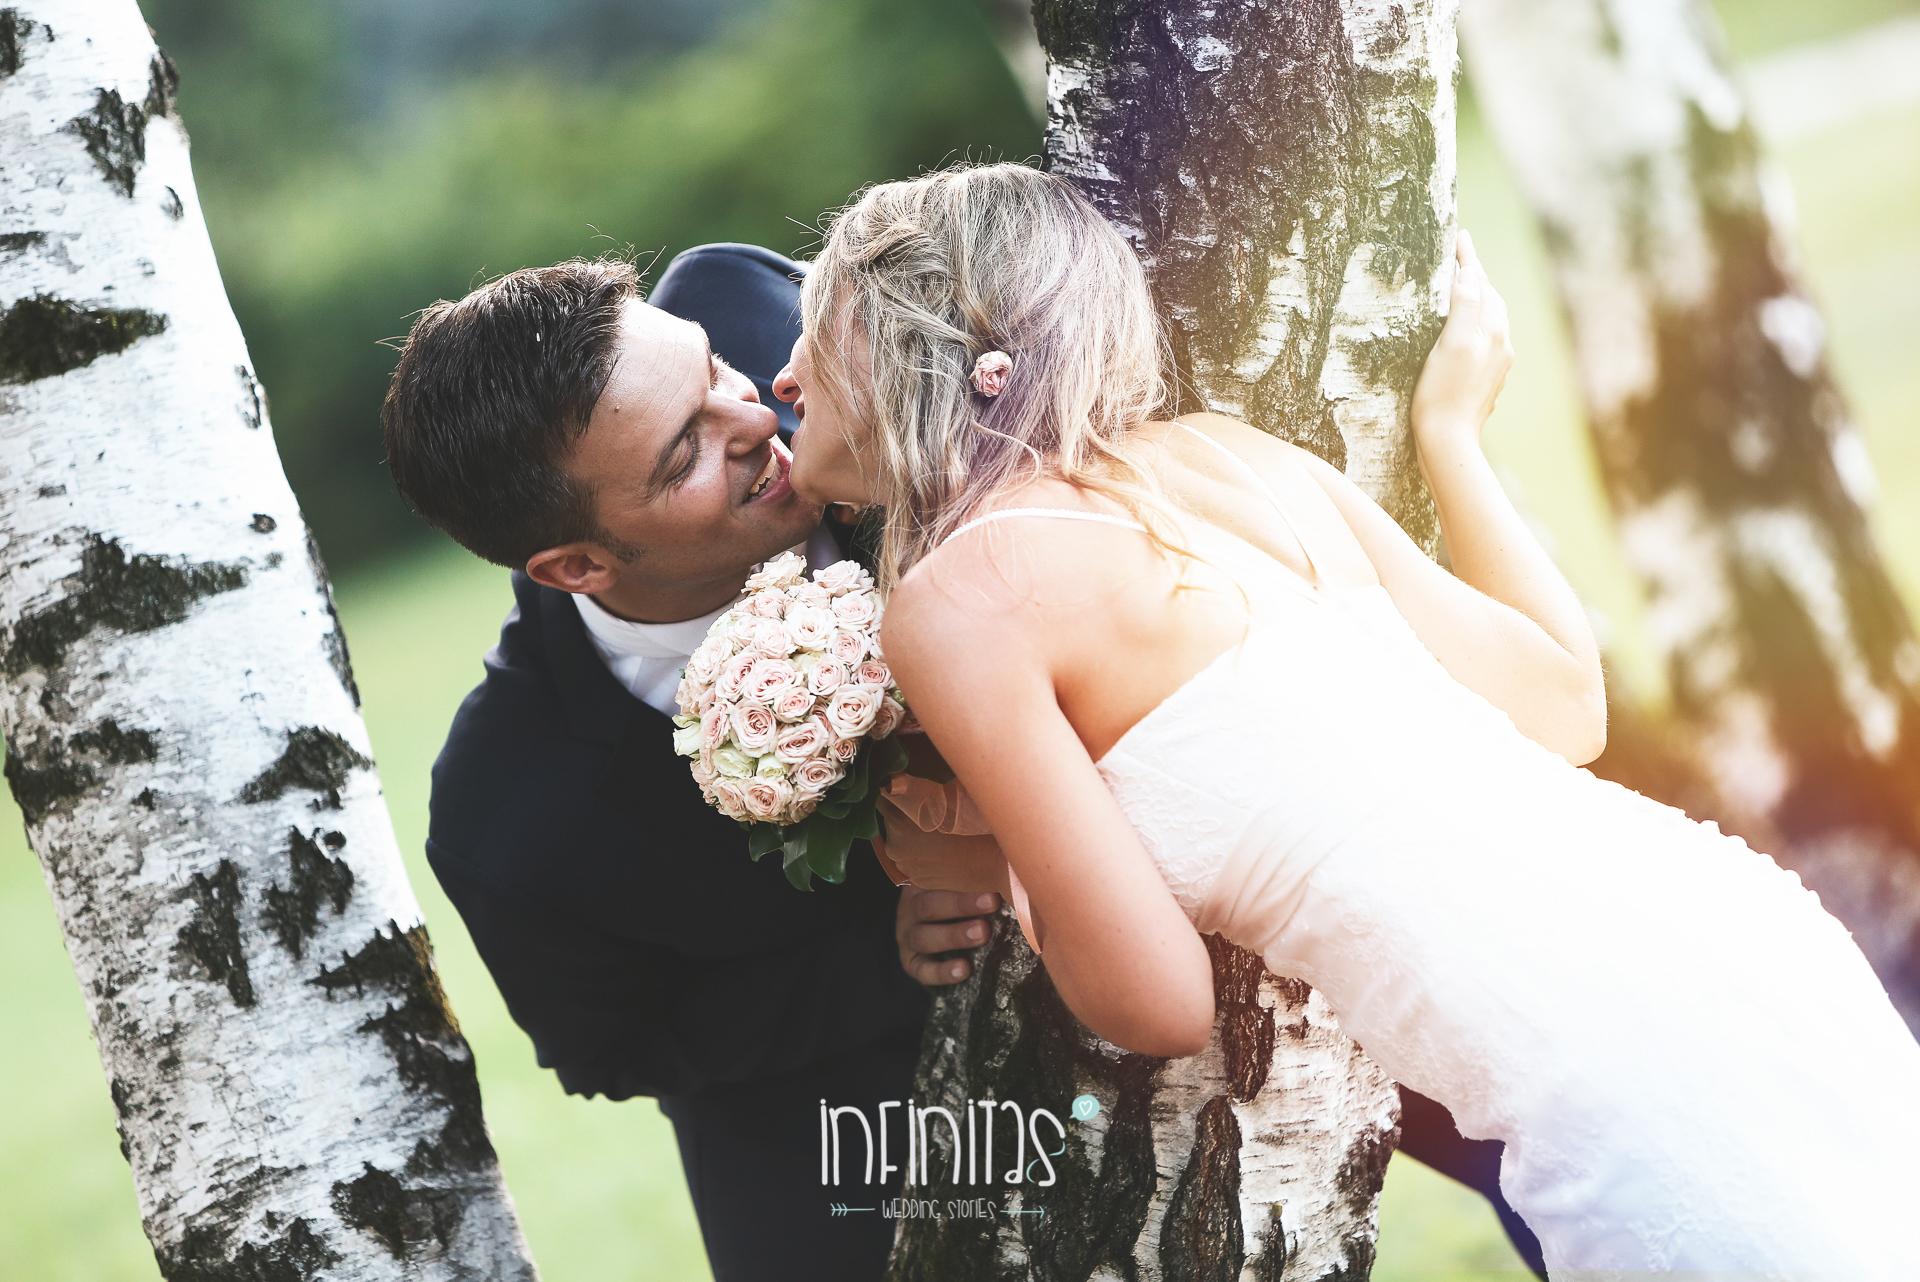 infinitas-sposi-esterni-verde-natura-alberi